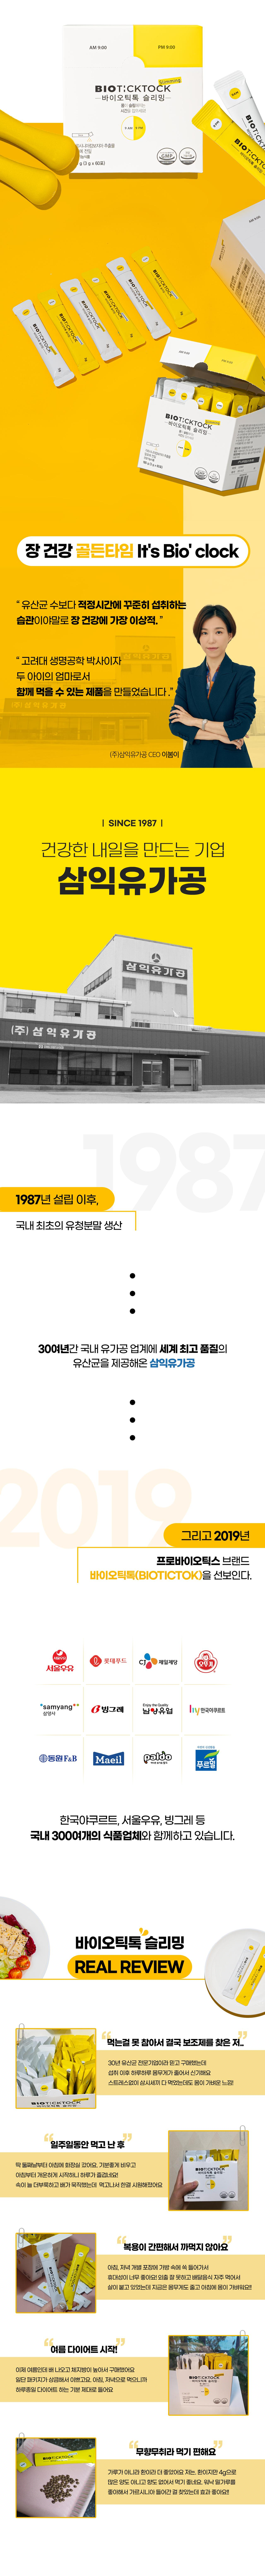 7e871b8409638.jpg (1280×12456)